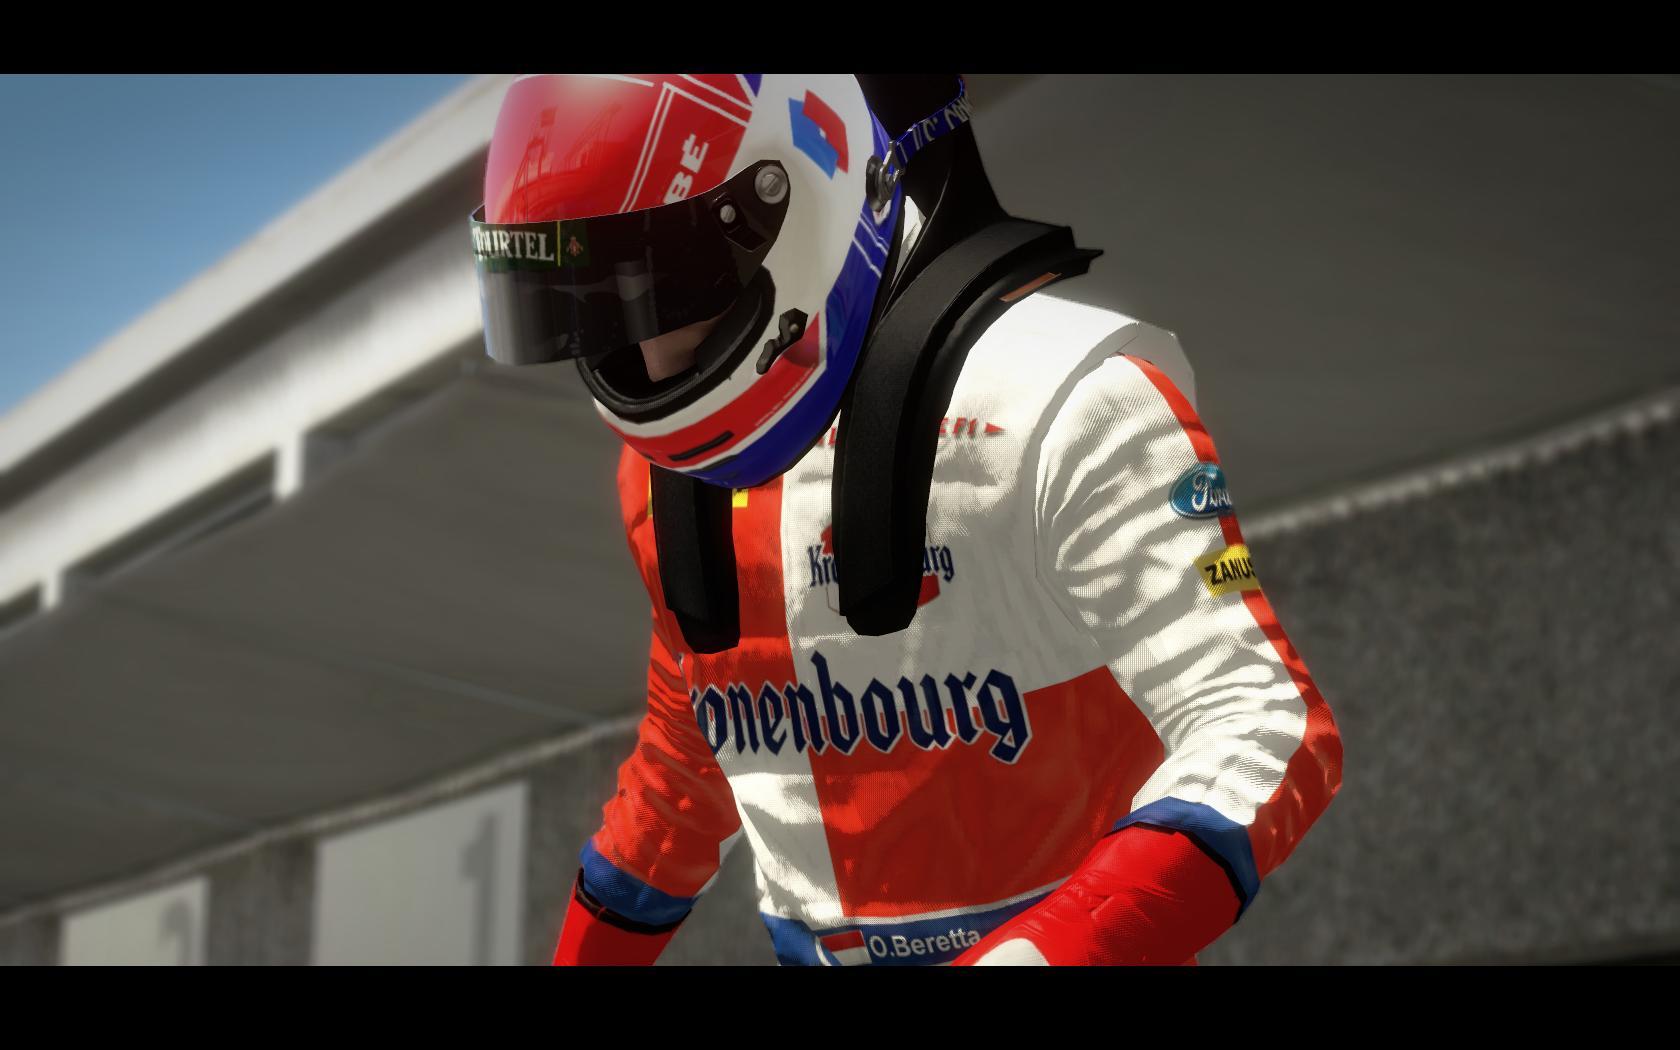 1994-Larrousse-driver.jpg